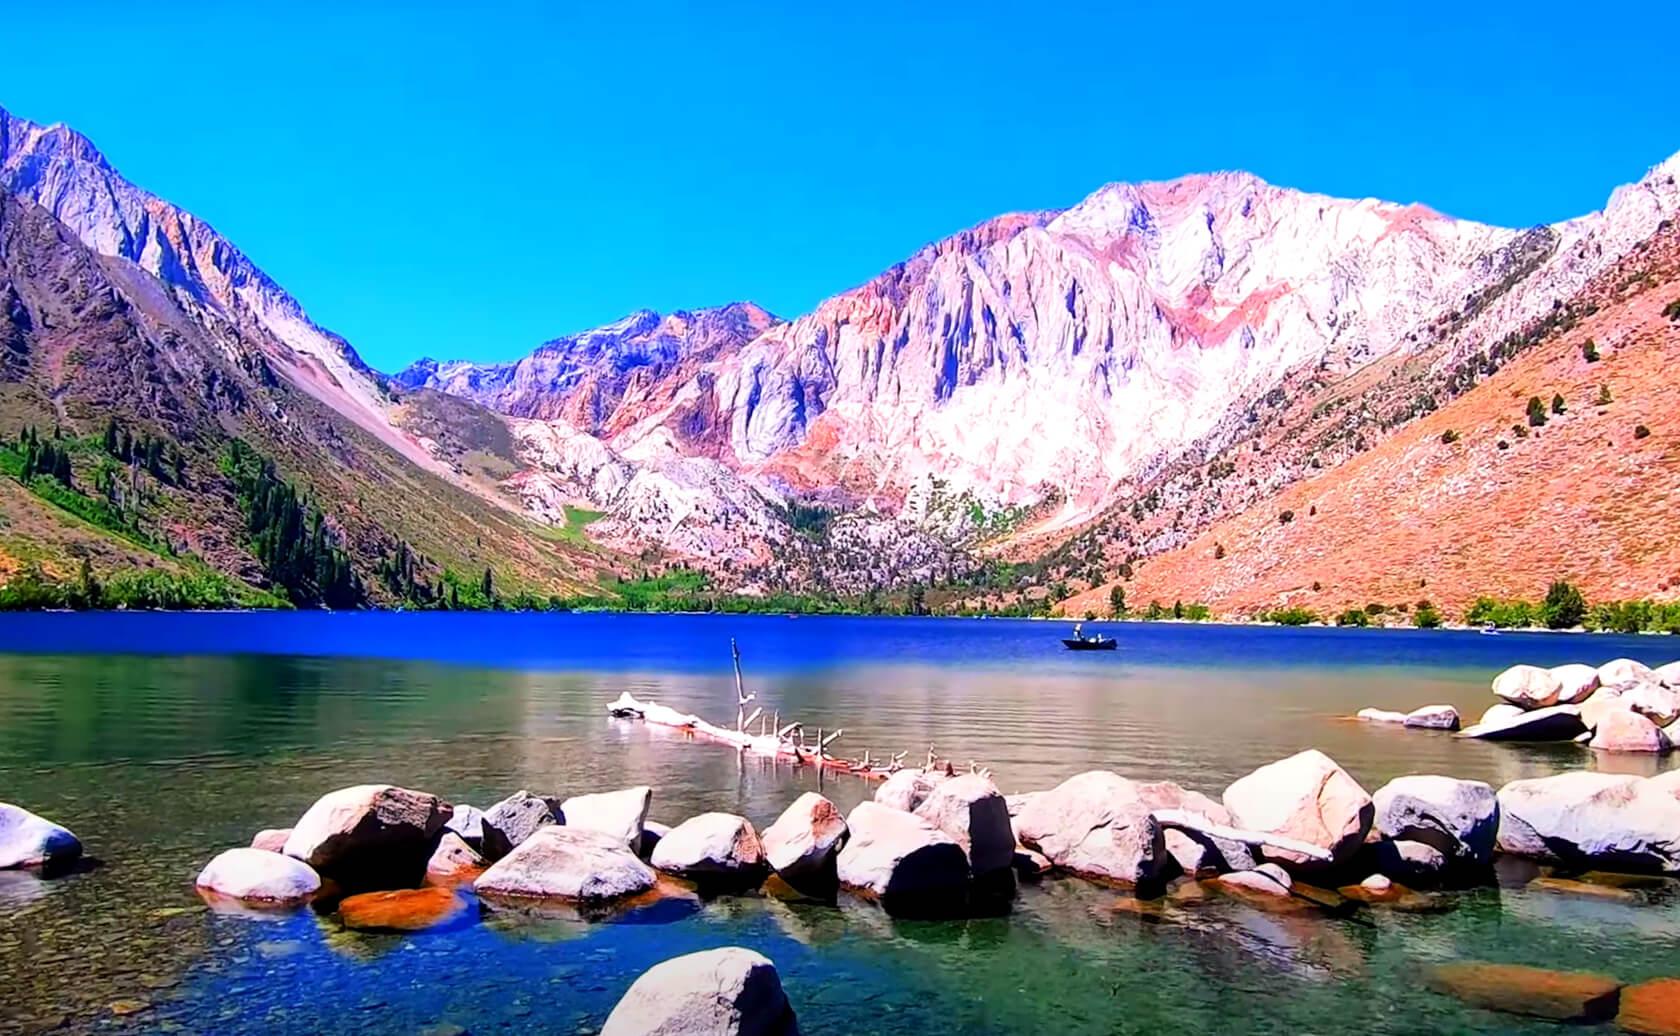 Convict-Lake-Reservoir-Fishing-Guide-Report-California-09